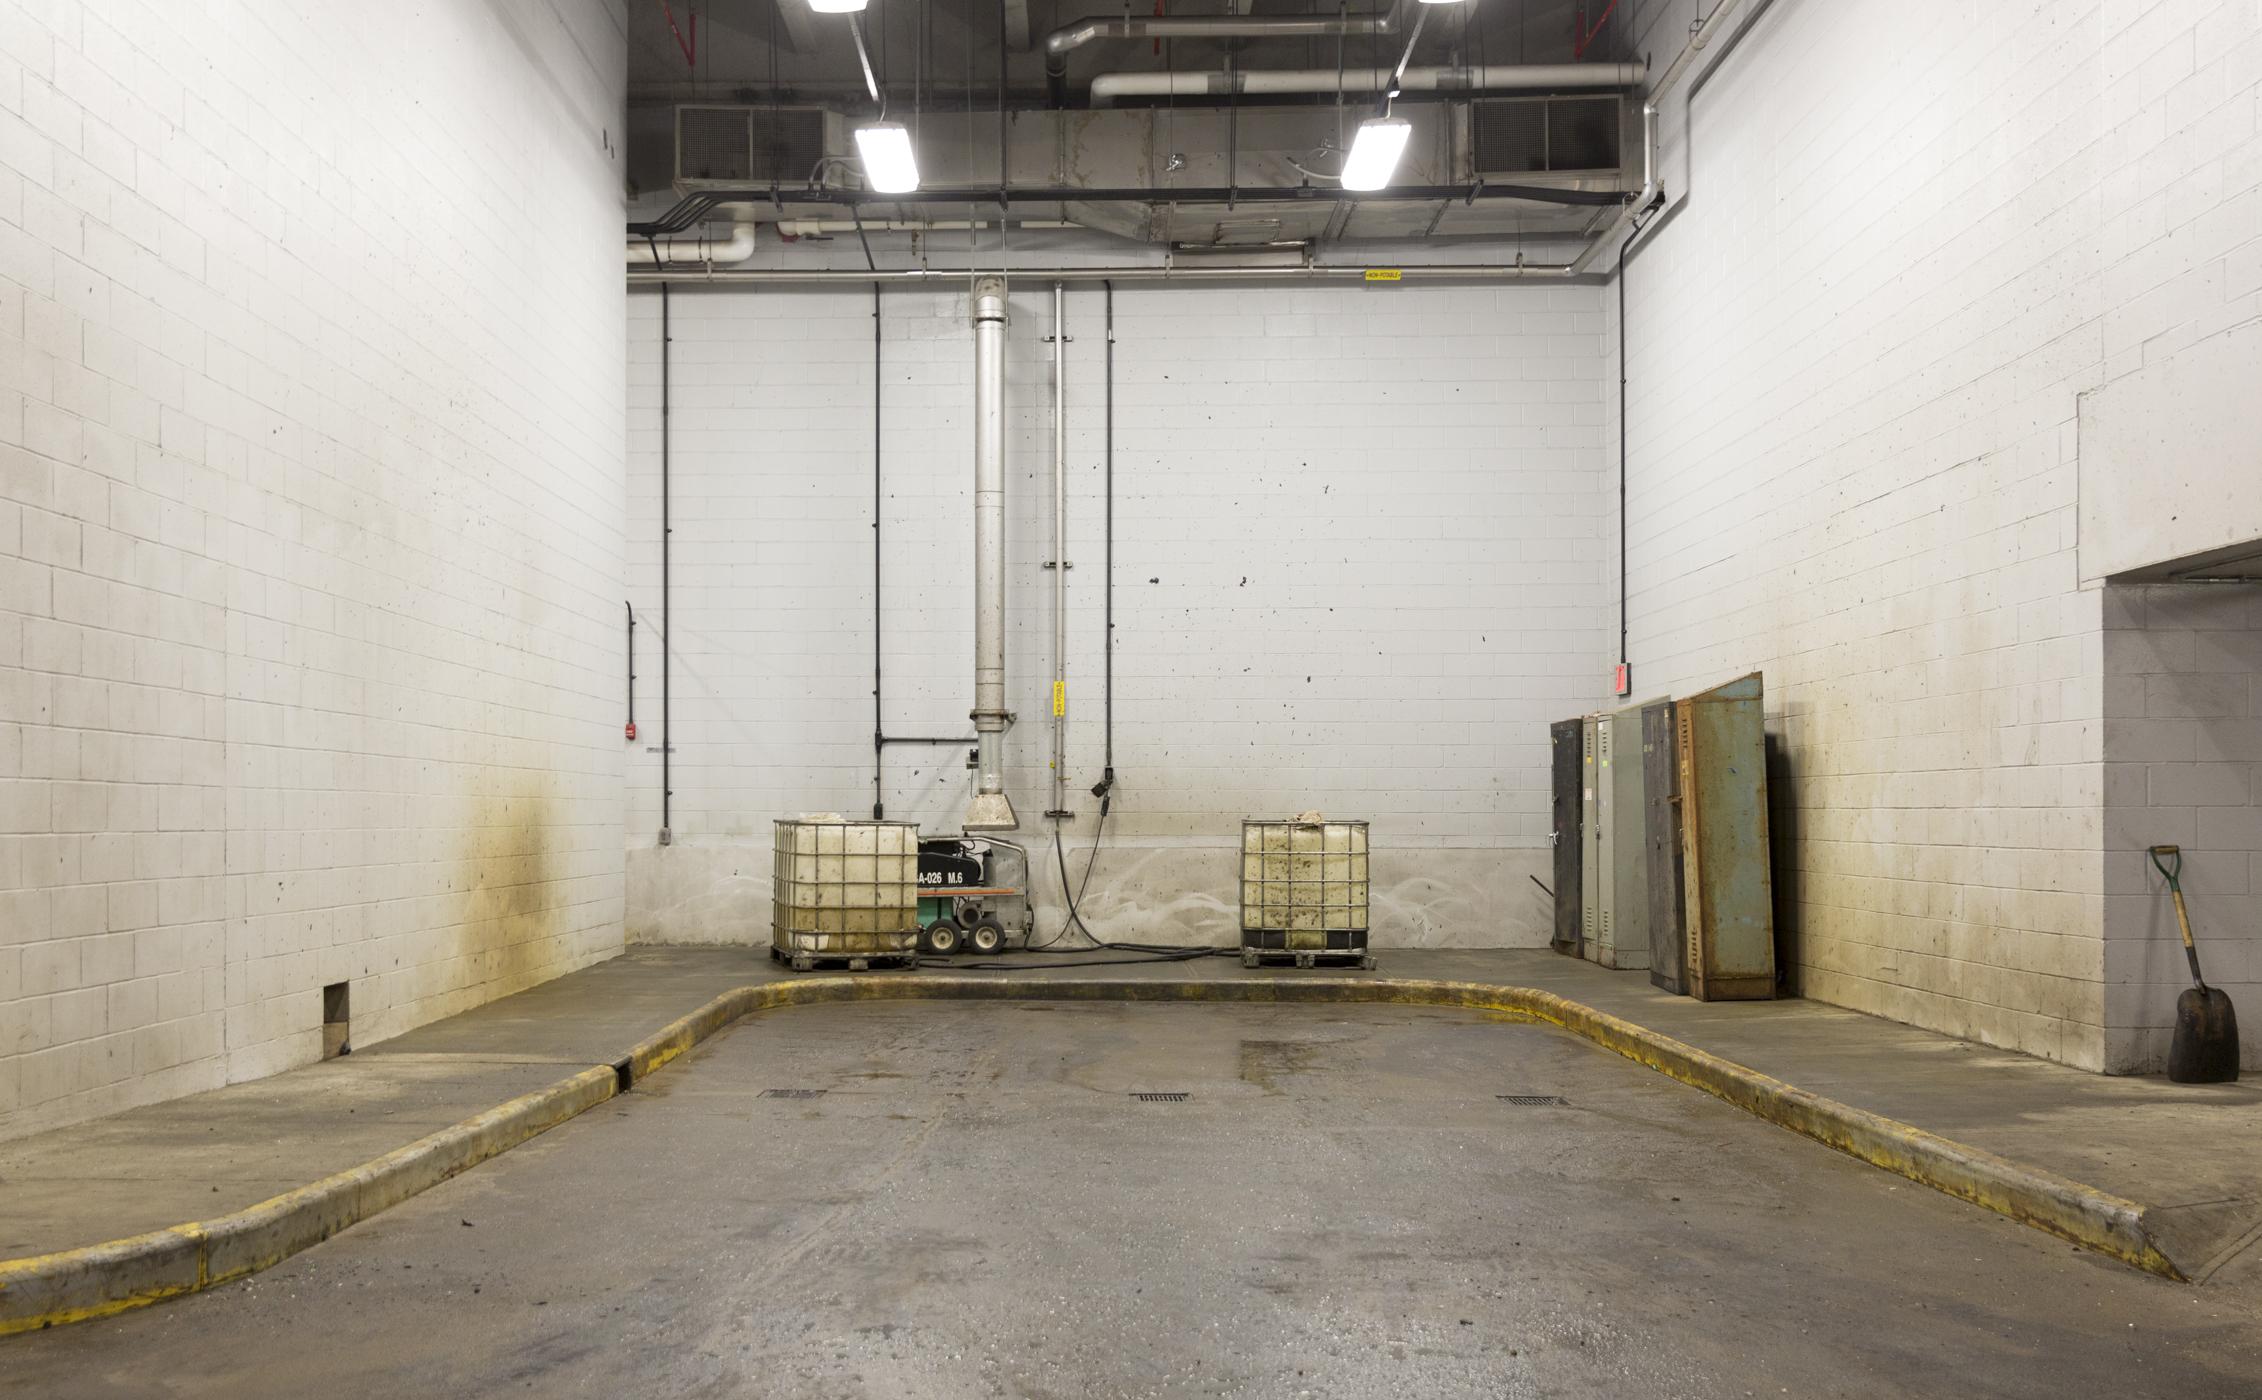 Garage1-2-5SaltShed-6943.jpg